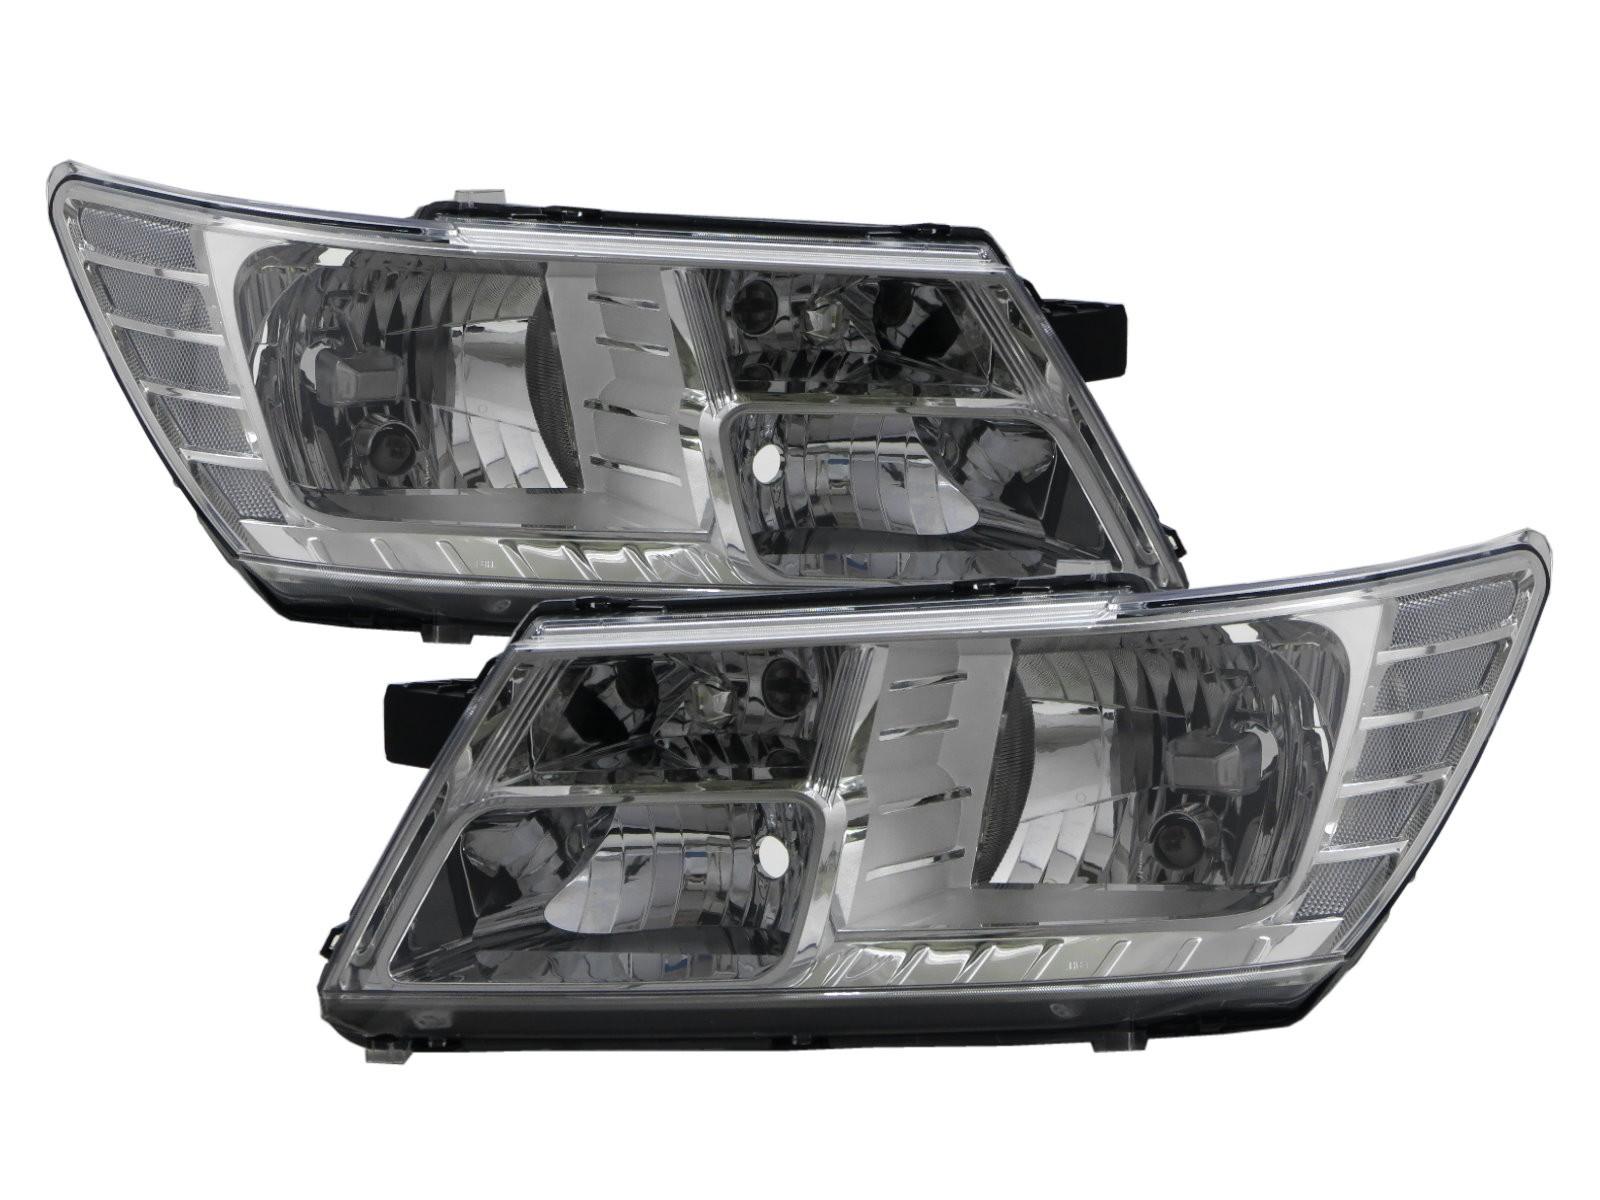 CrazyTheGod Journey JC 2009-present SUV 5D Clear Headlight Headlamp Chrome for DODGE LHD